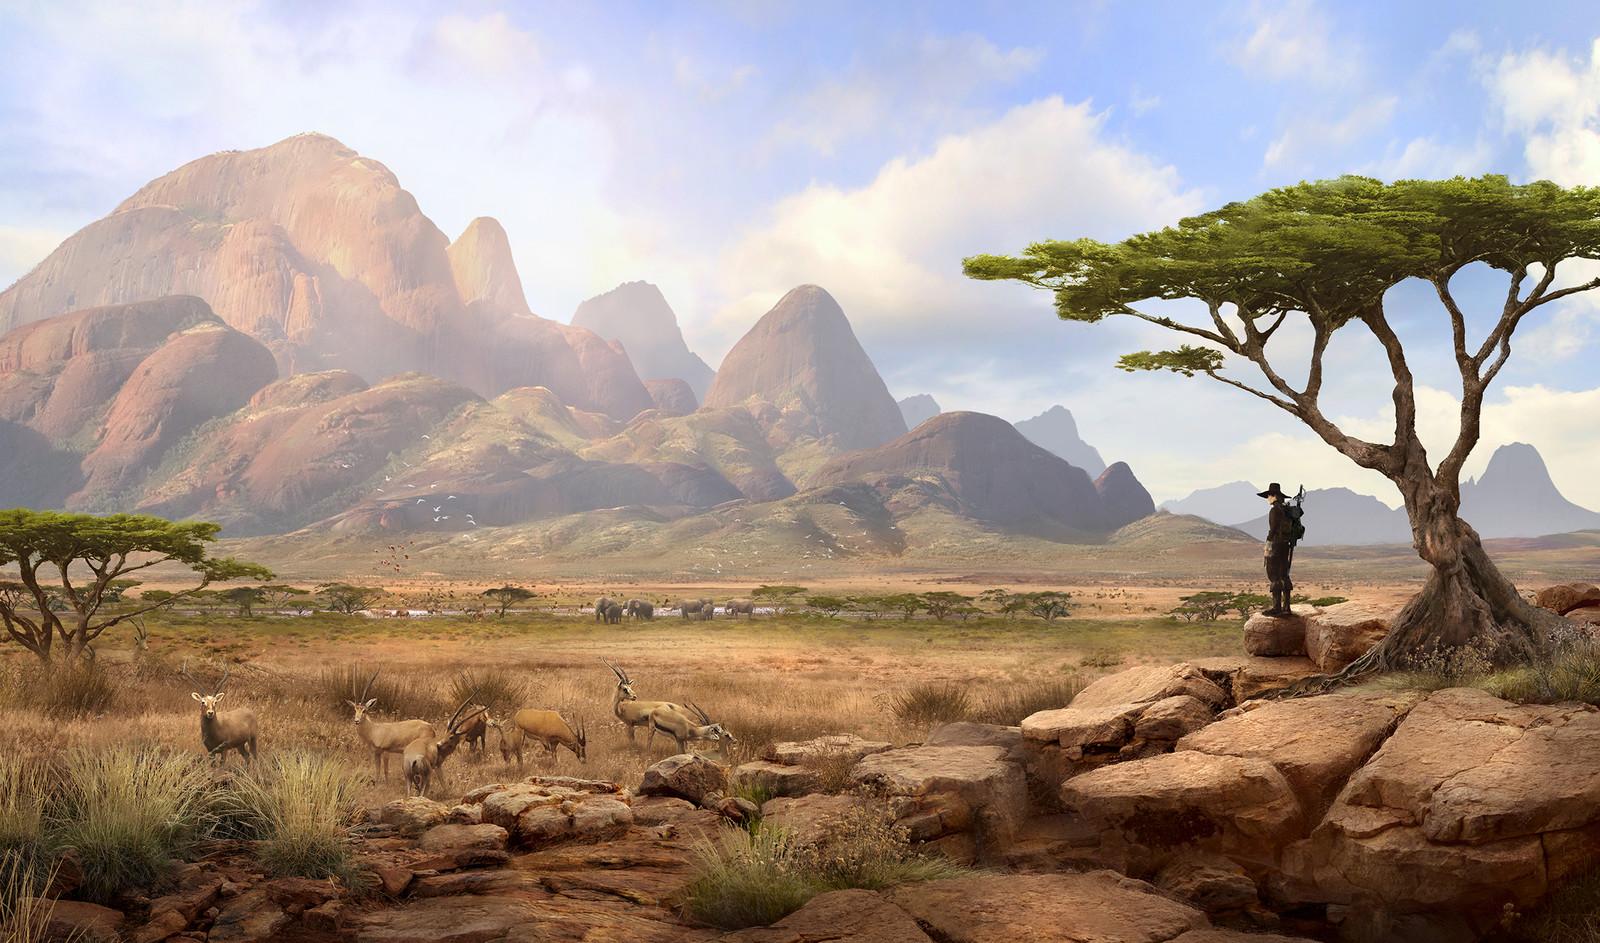 Solomon Kane - Africa 2 Landscape